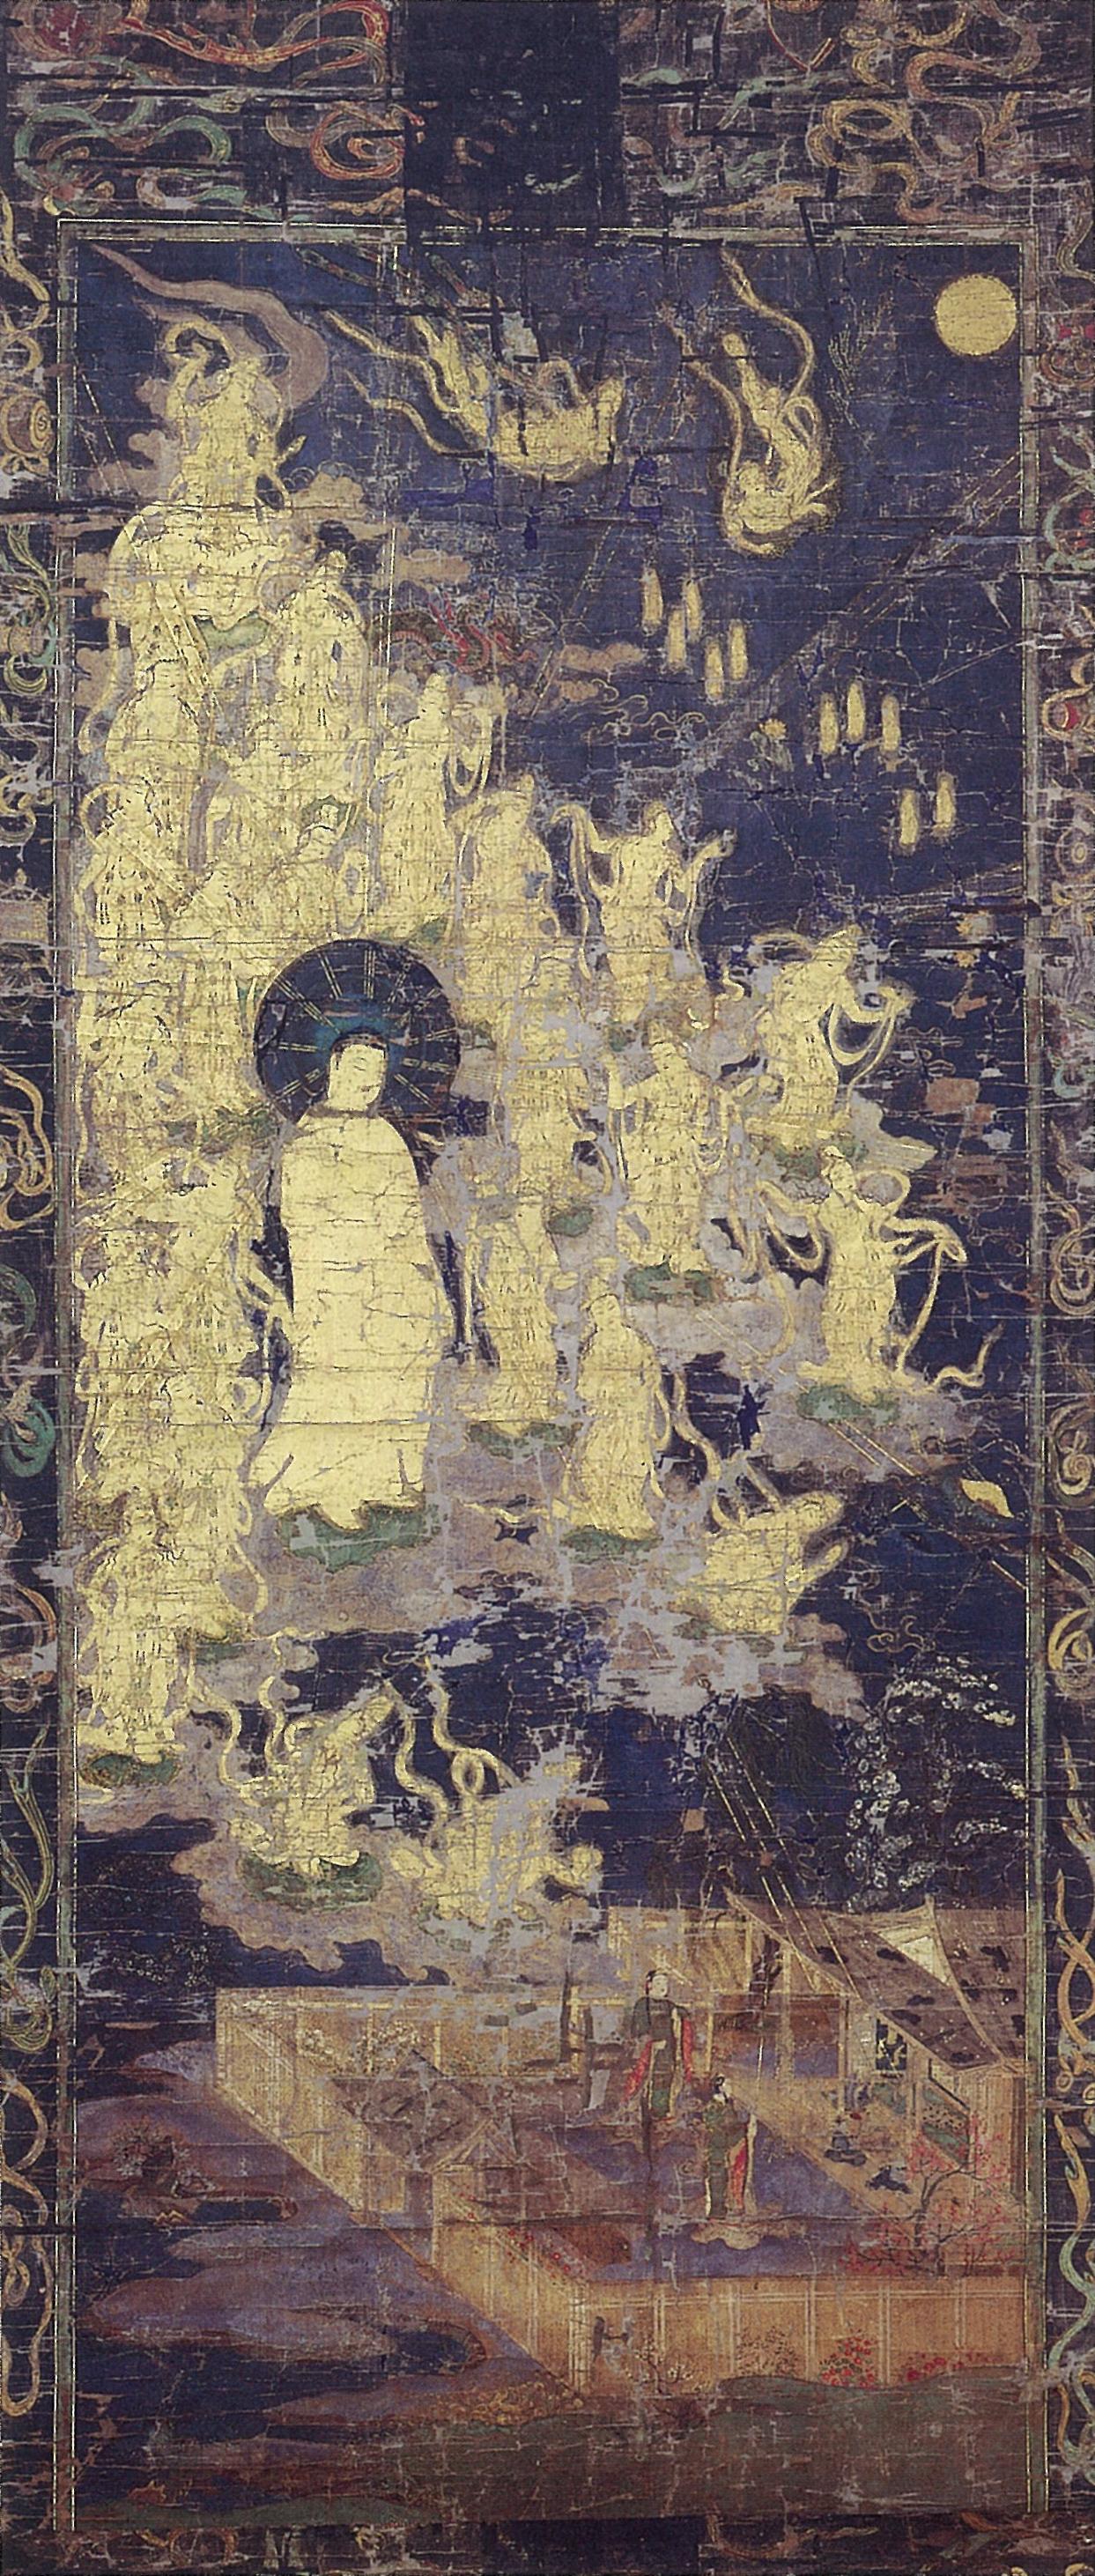 escentofmitbhamidaand25odhisattvas,amakuraperiod1185-1333,ukushimauseum,apan